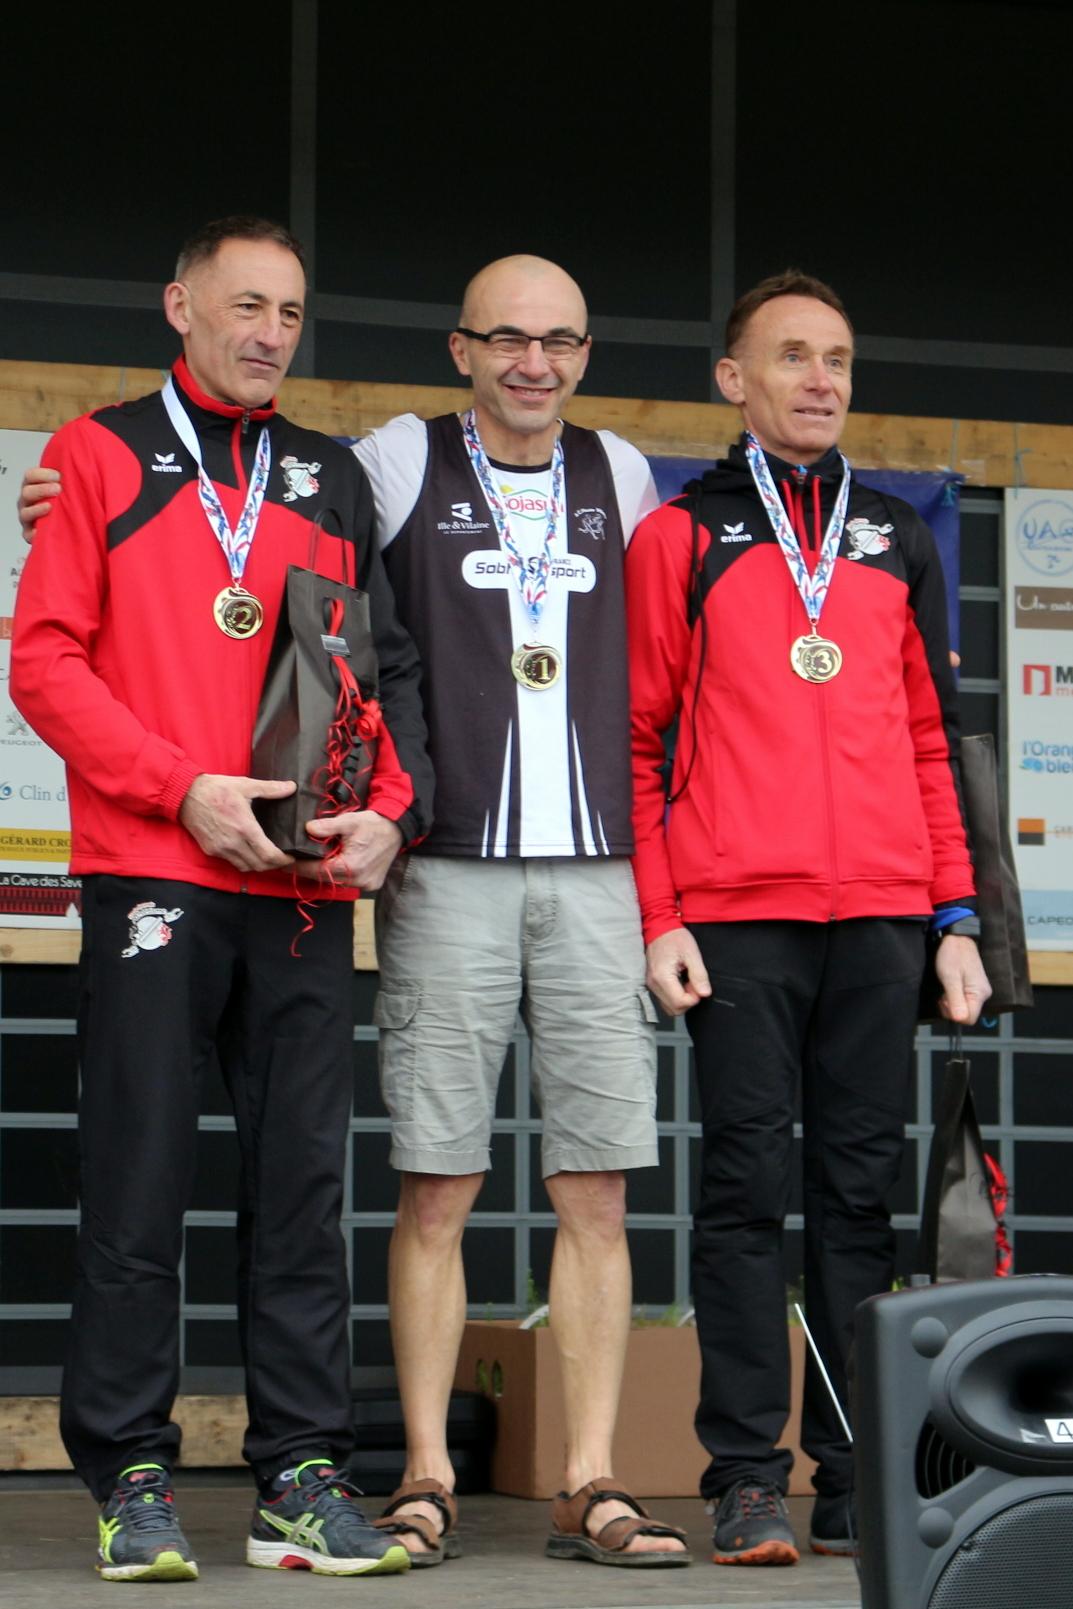 MN podium 03